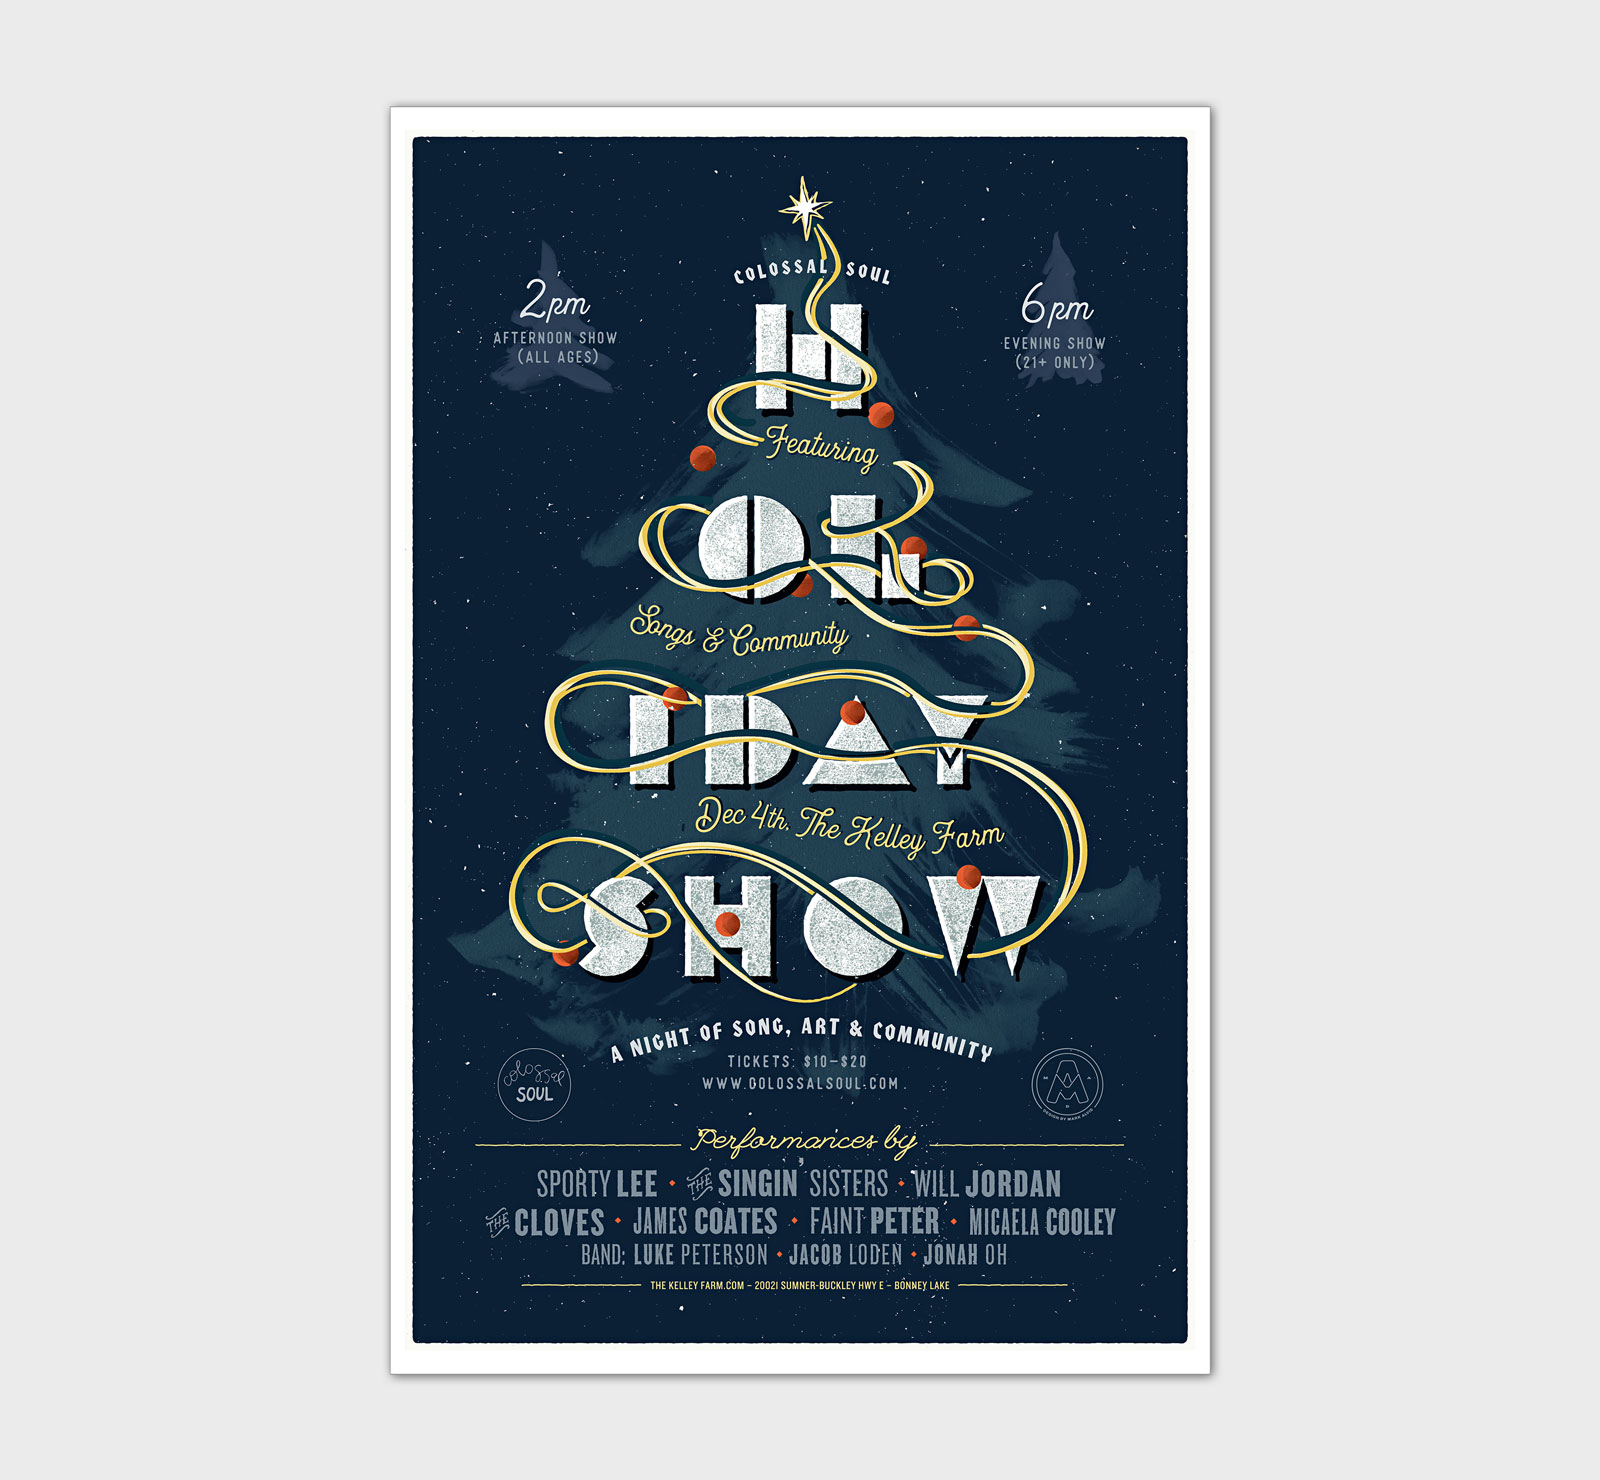 Holiday_Poster_1600.jpg